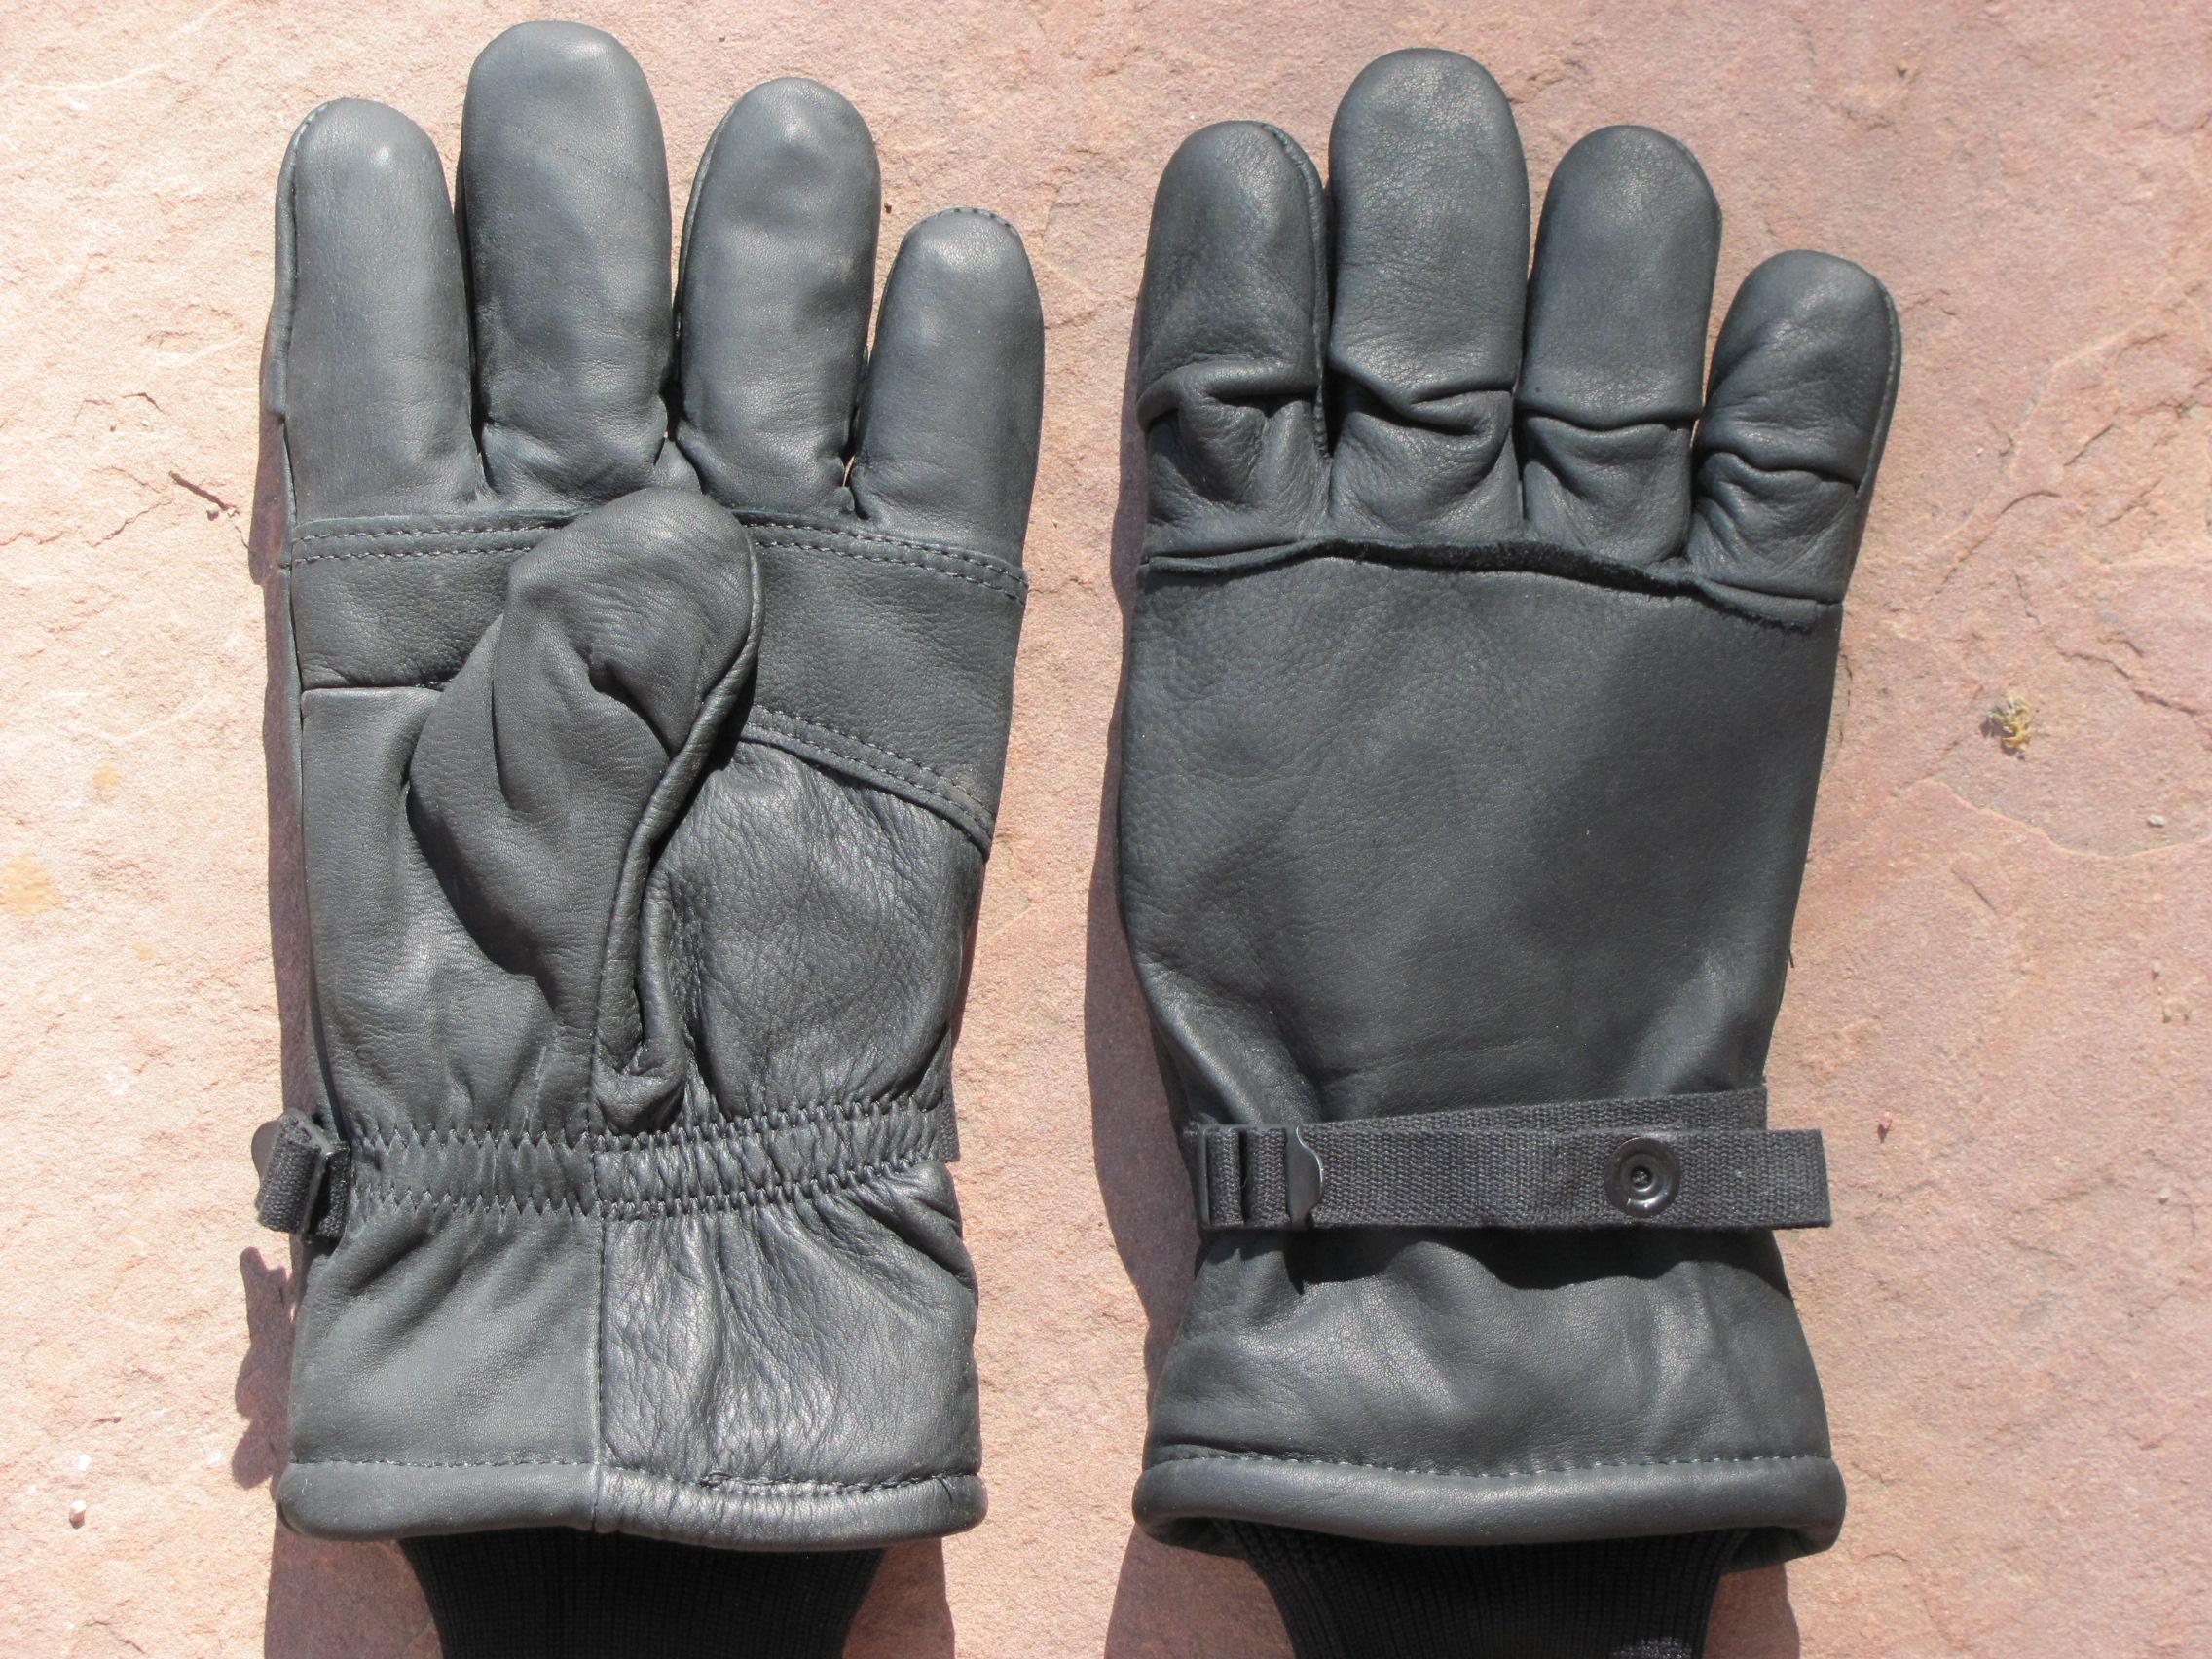 Gloves intermediate cold/wet